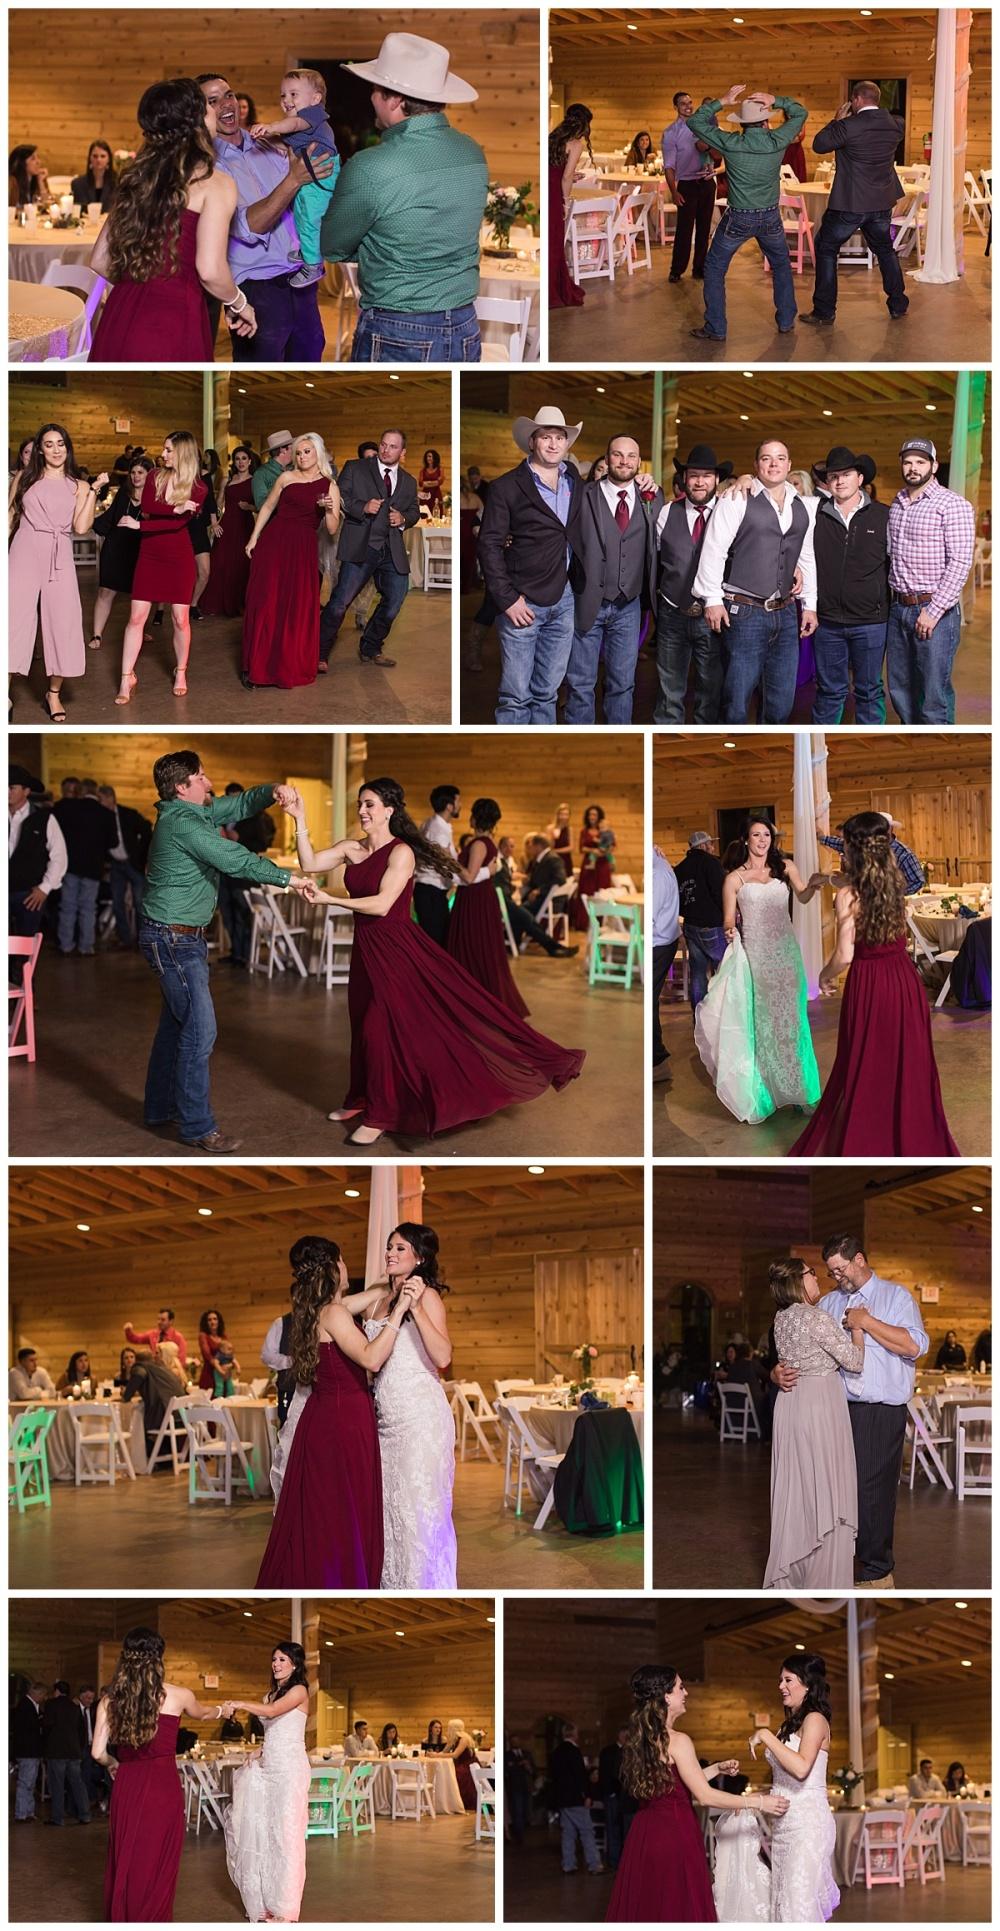 Carly-Barton-Photography-Geronimo-Oaks-Wedding-Venue-Texas-Hill-Country-Ronnie-Sarah_0134.jpg